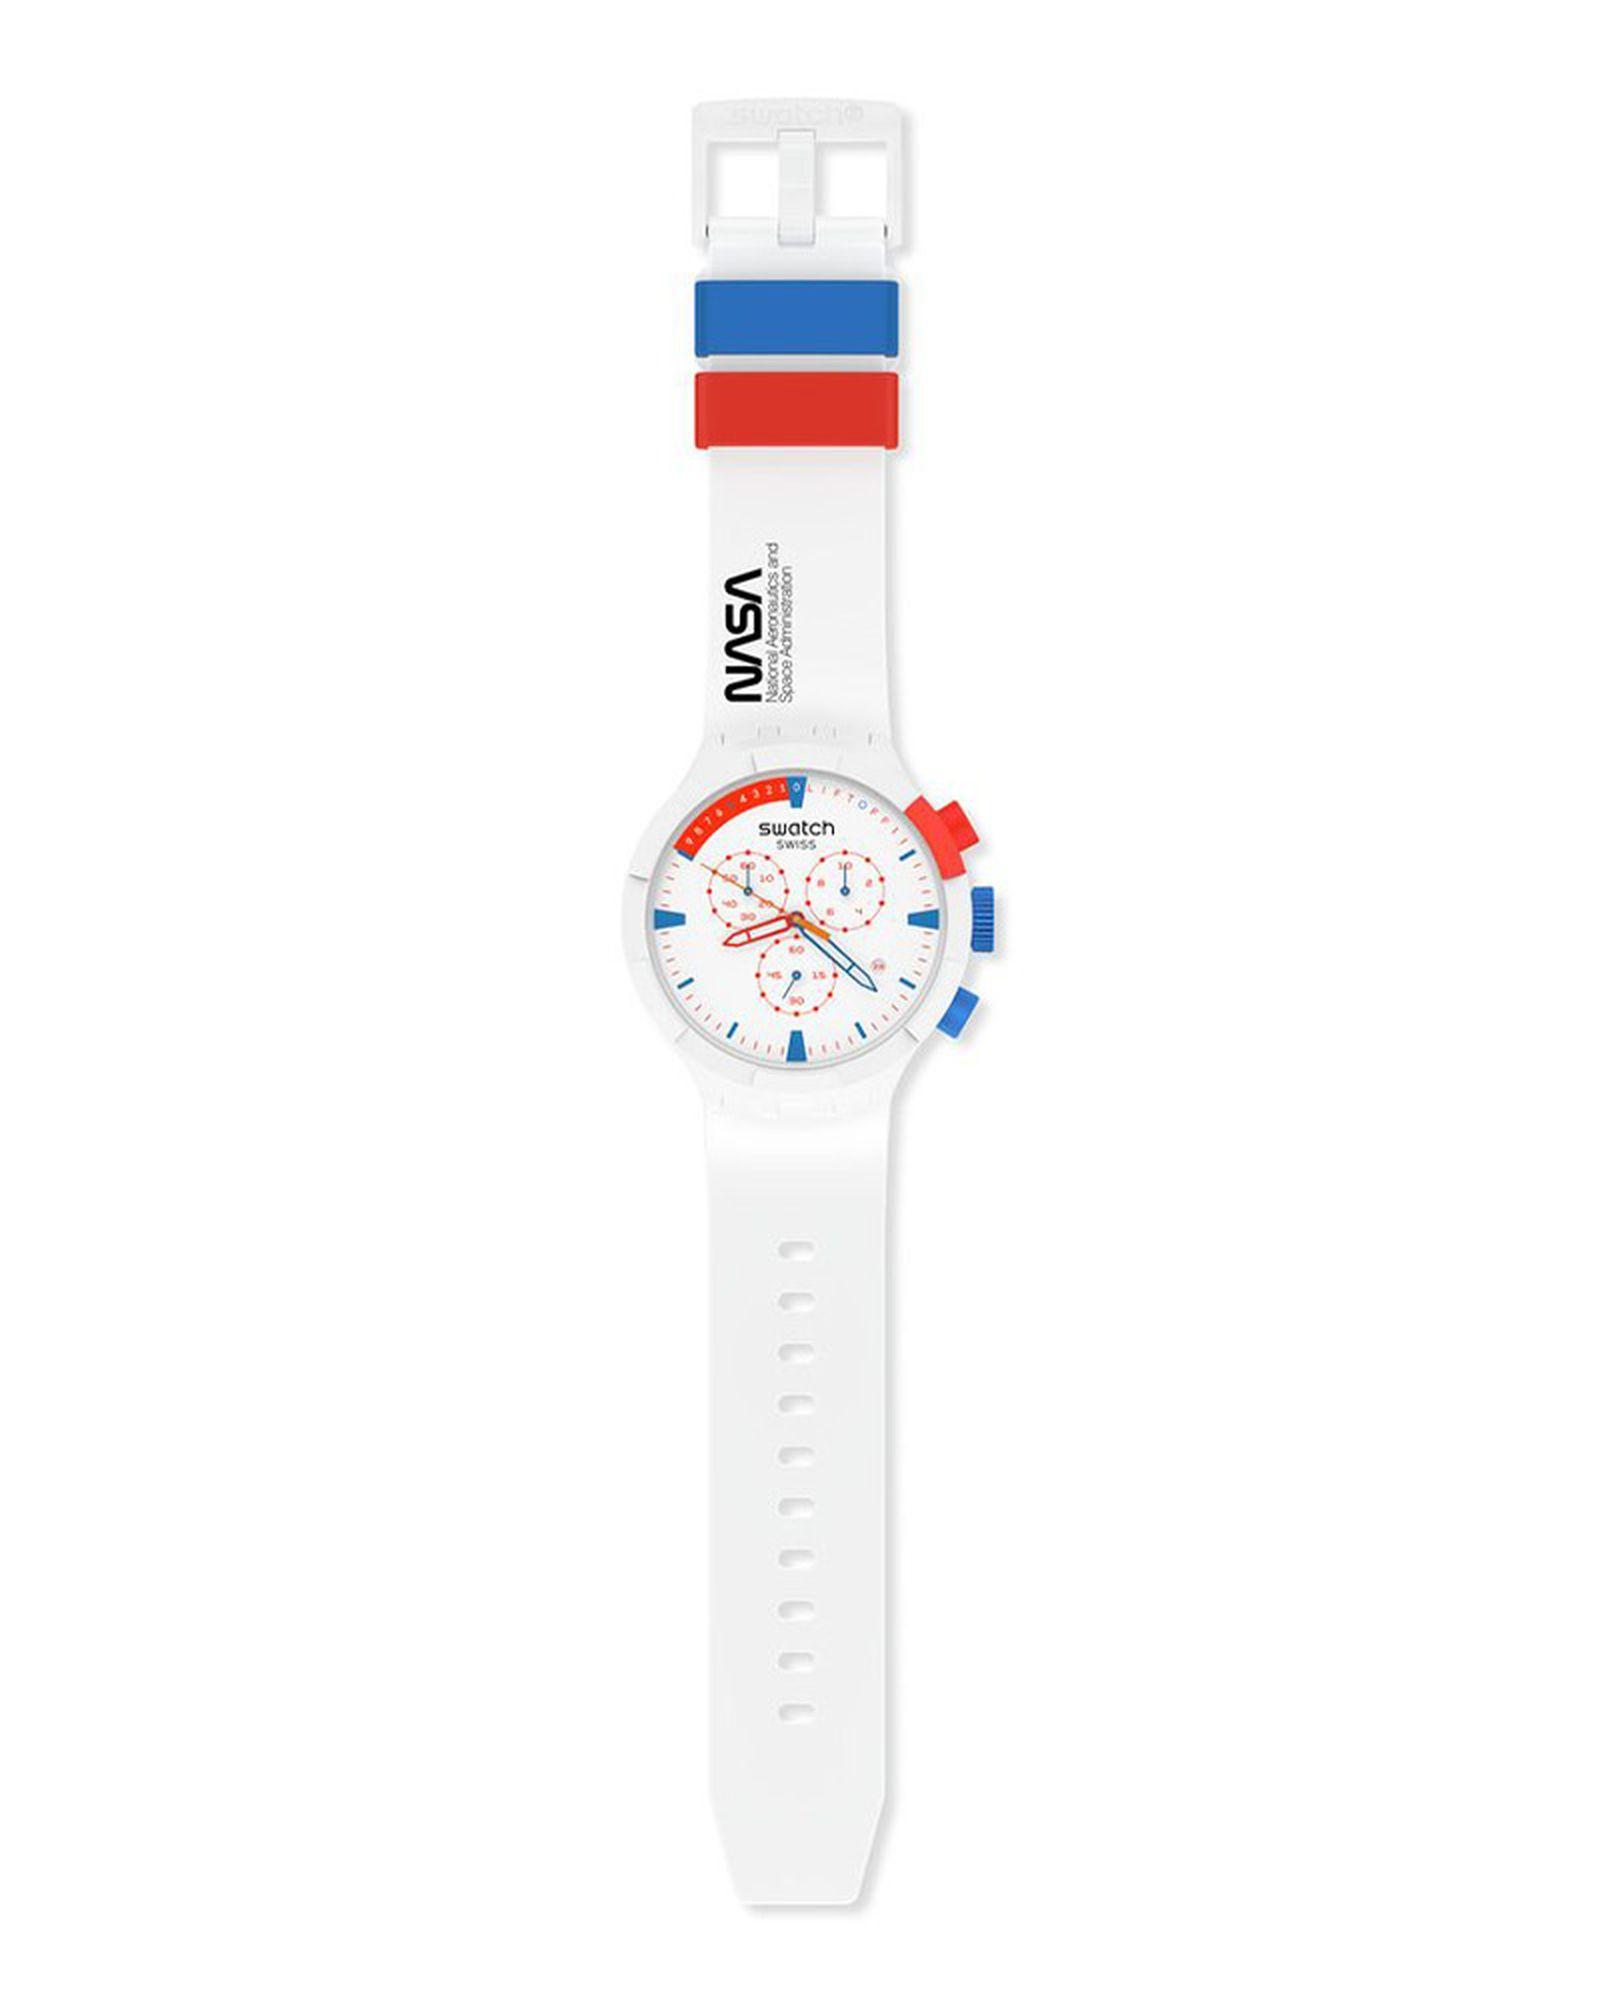 swatch-nasa-watch-03